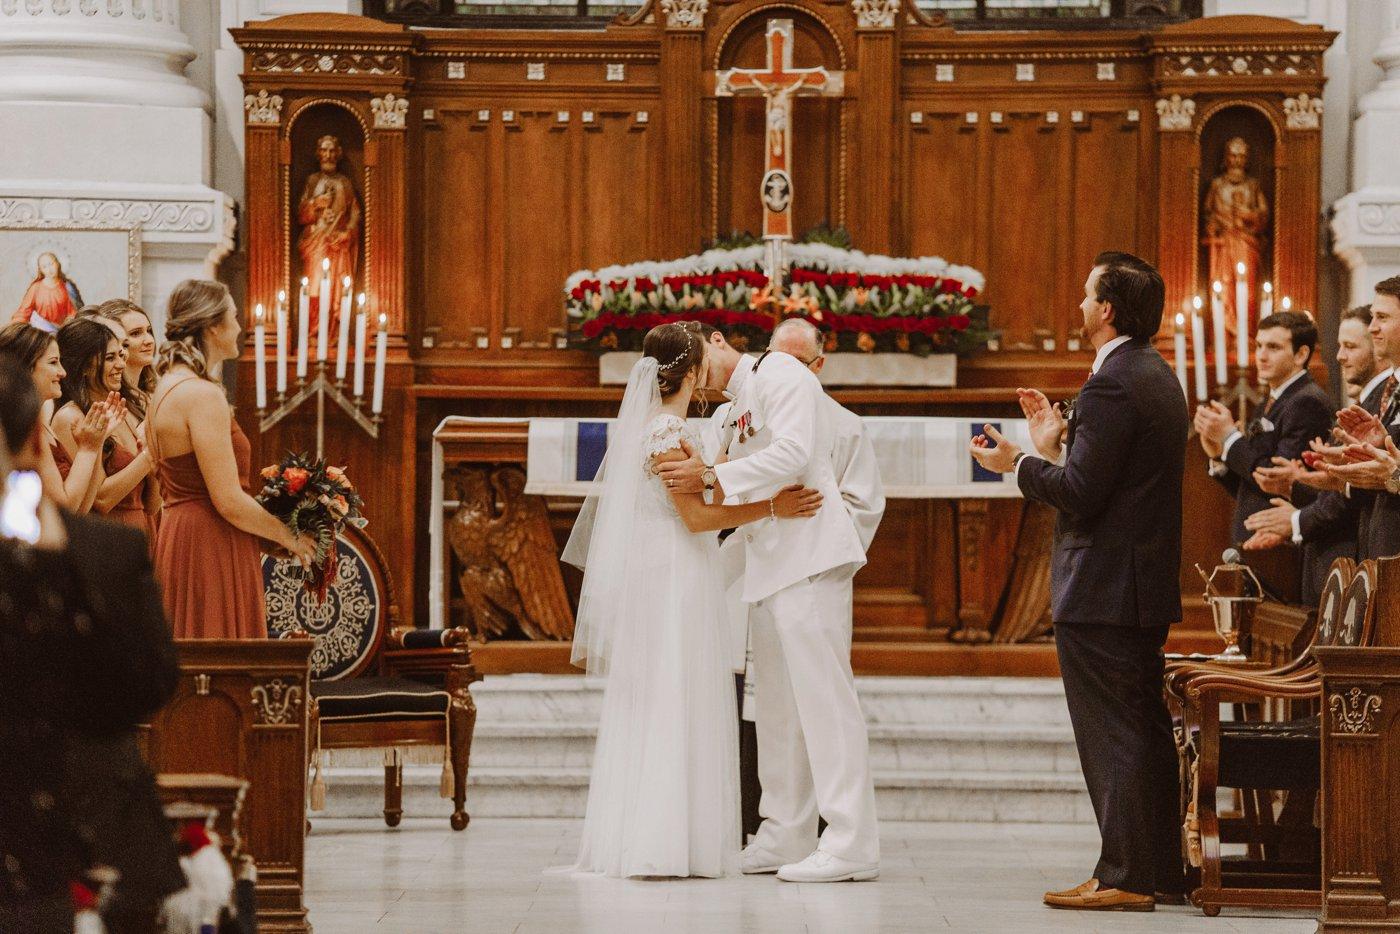 USNA chapel wedding ceremony Downtown Annapolis Maryland wedding photographer